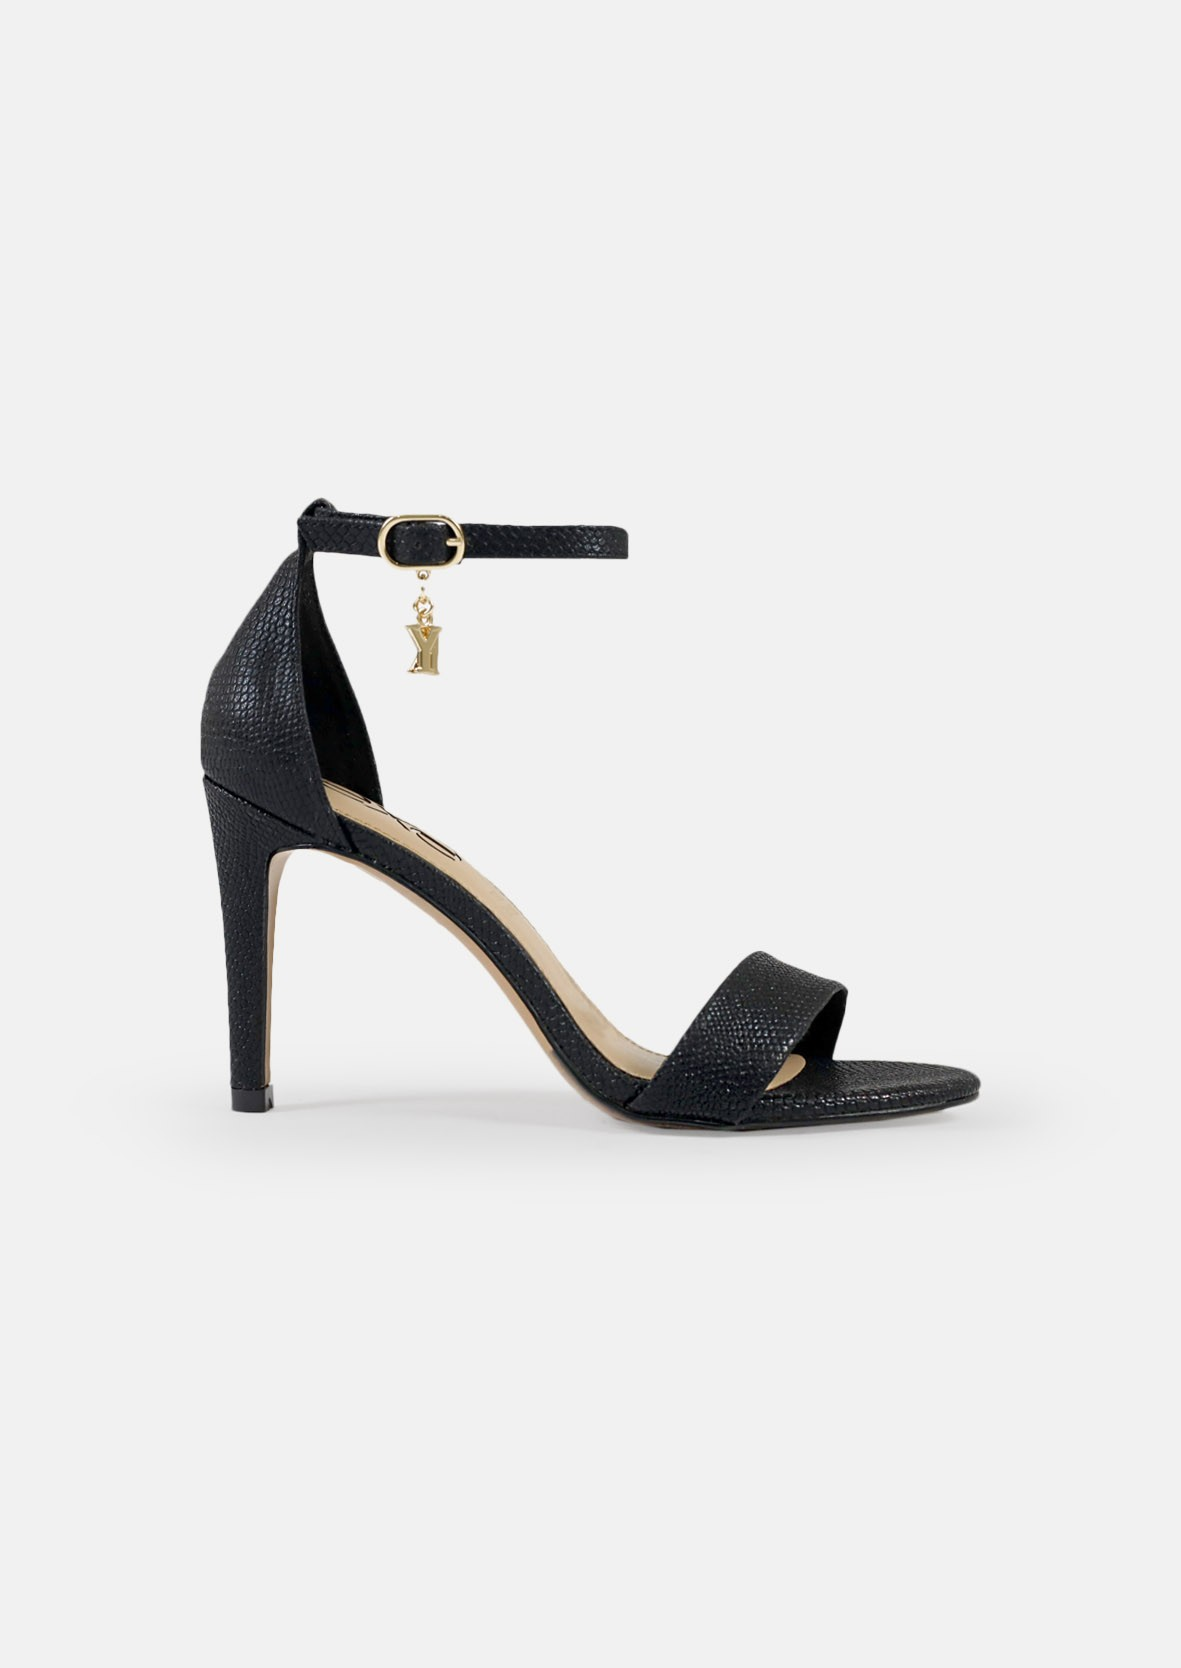 EXE Shoes Πέδιλα Γυναικεία REBECA-931 Μαύρο Φίδι M47009315006